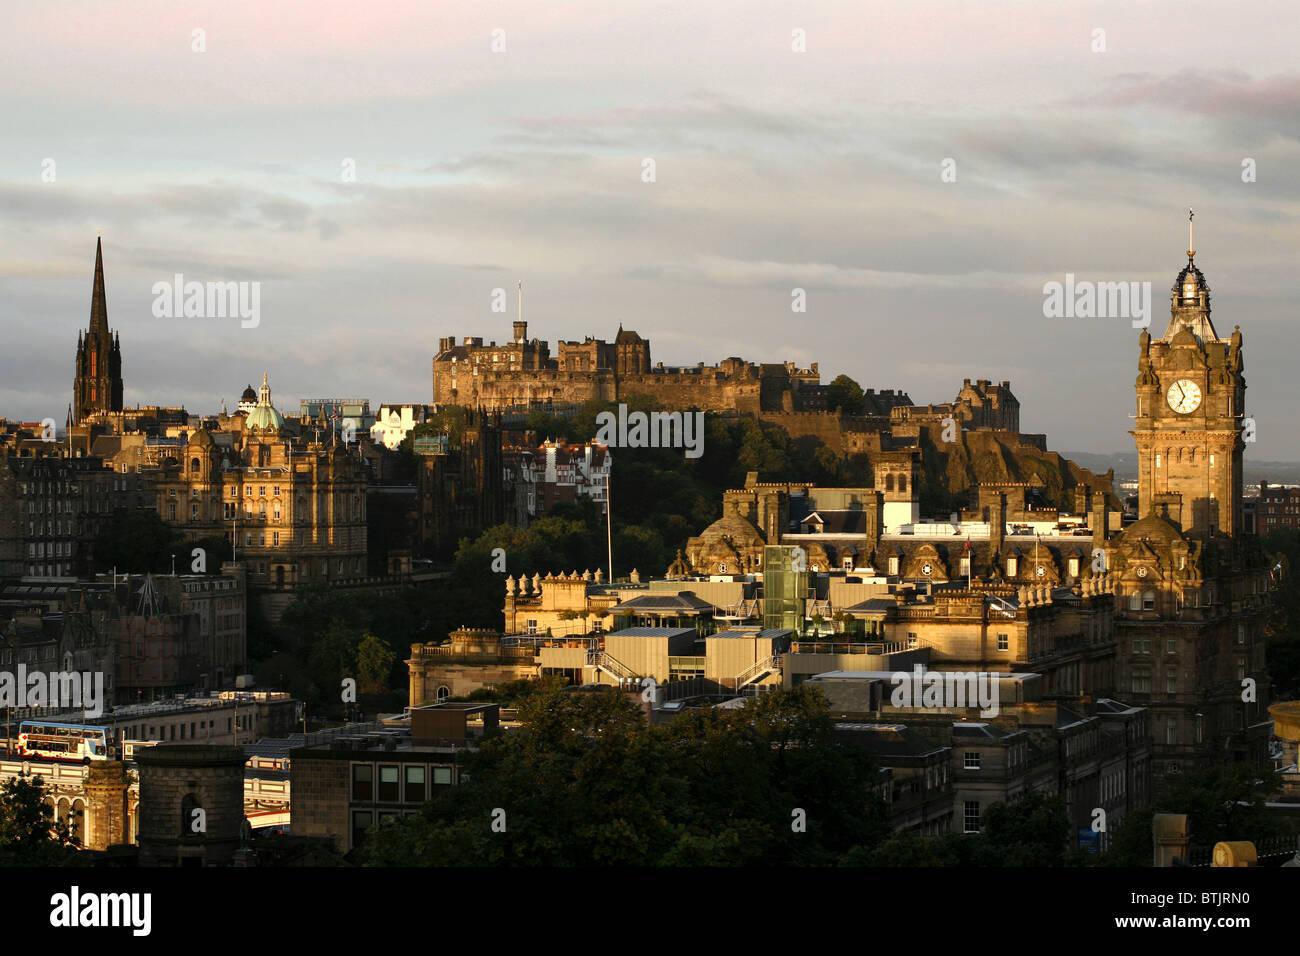 Edinburgh Castle & Balmoral Hotel seen from Calton Hill, Edinburgh, Scotland Stock Photo